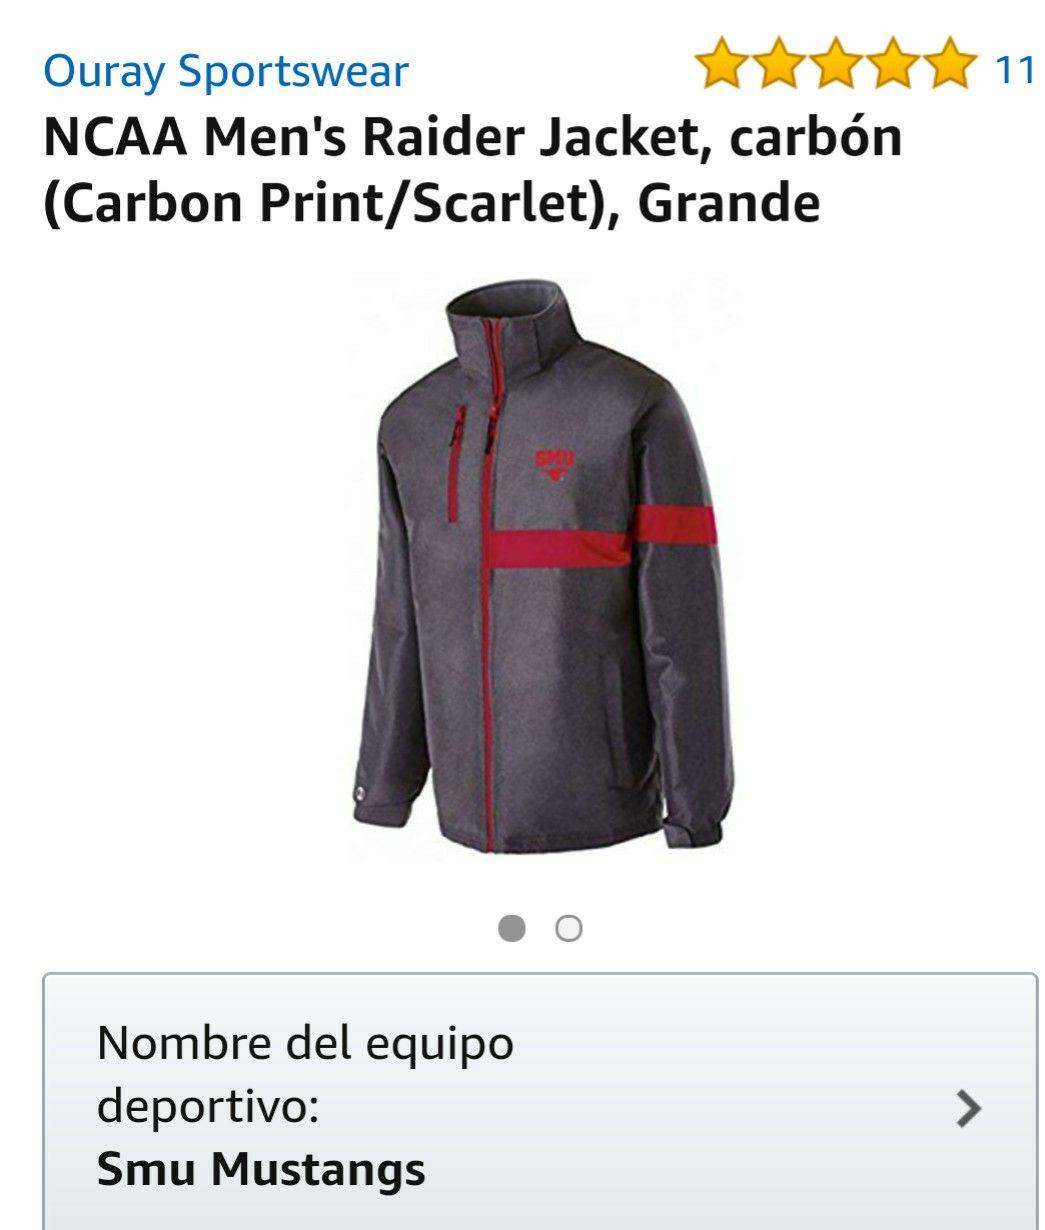 Amazon: Chamarra deportiva Ouray Sportswear talla G